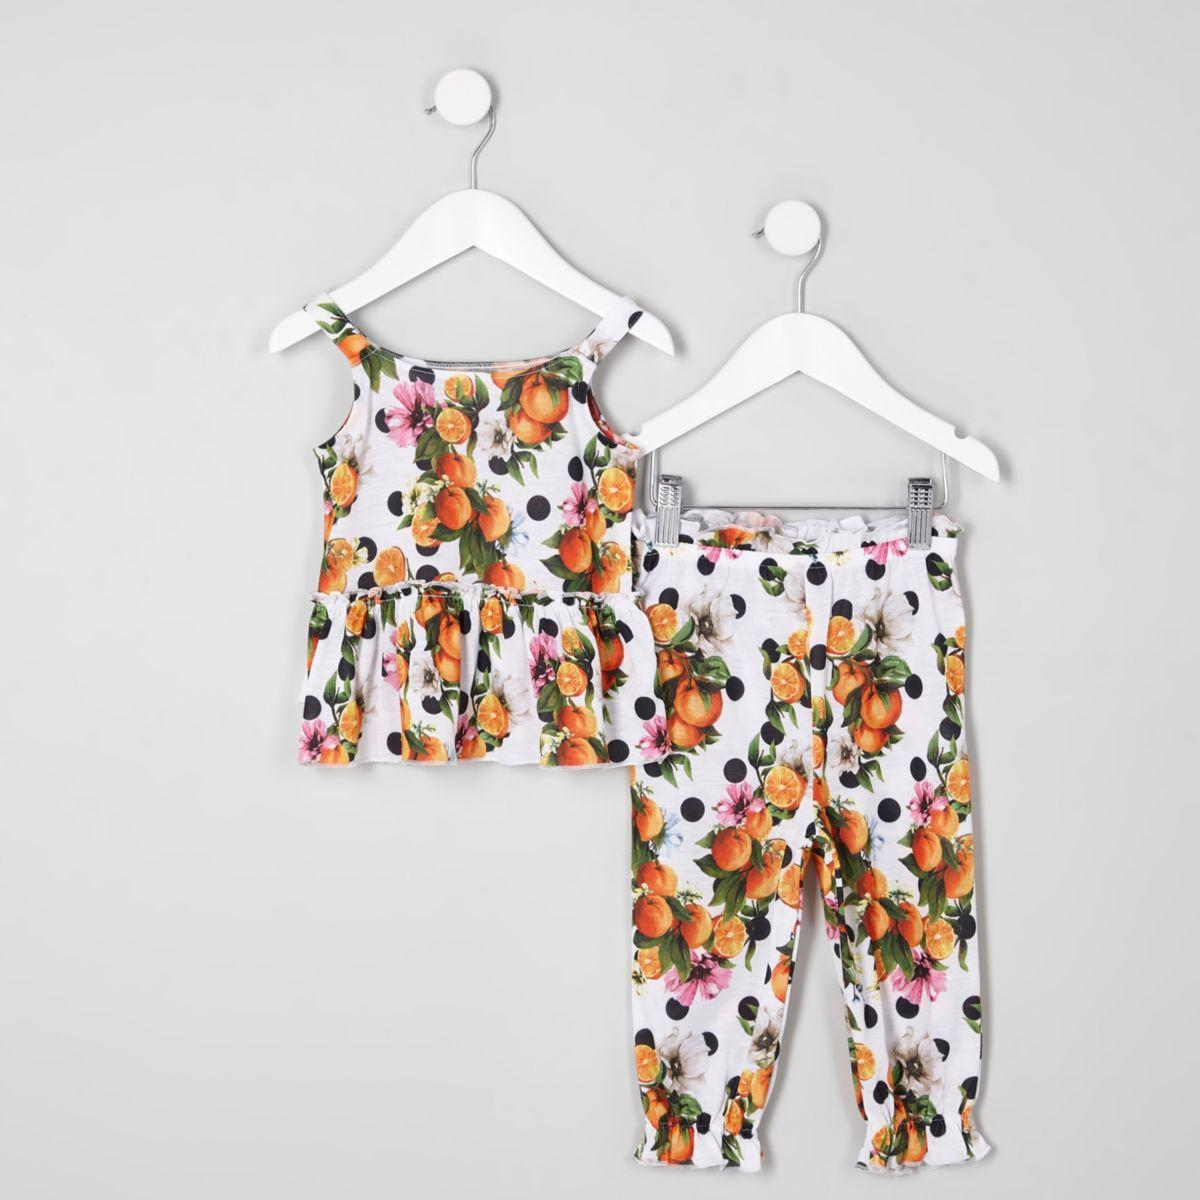 Mini girls white polka dot cami top outfit